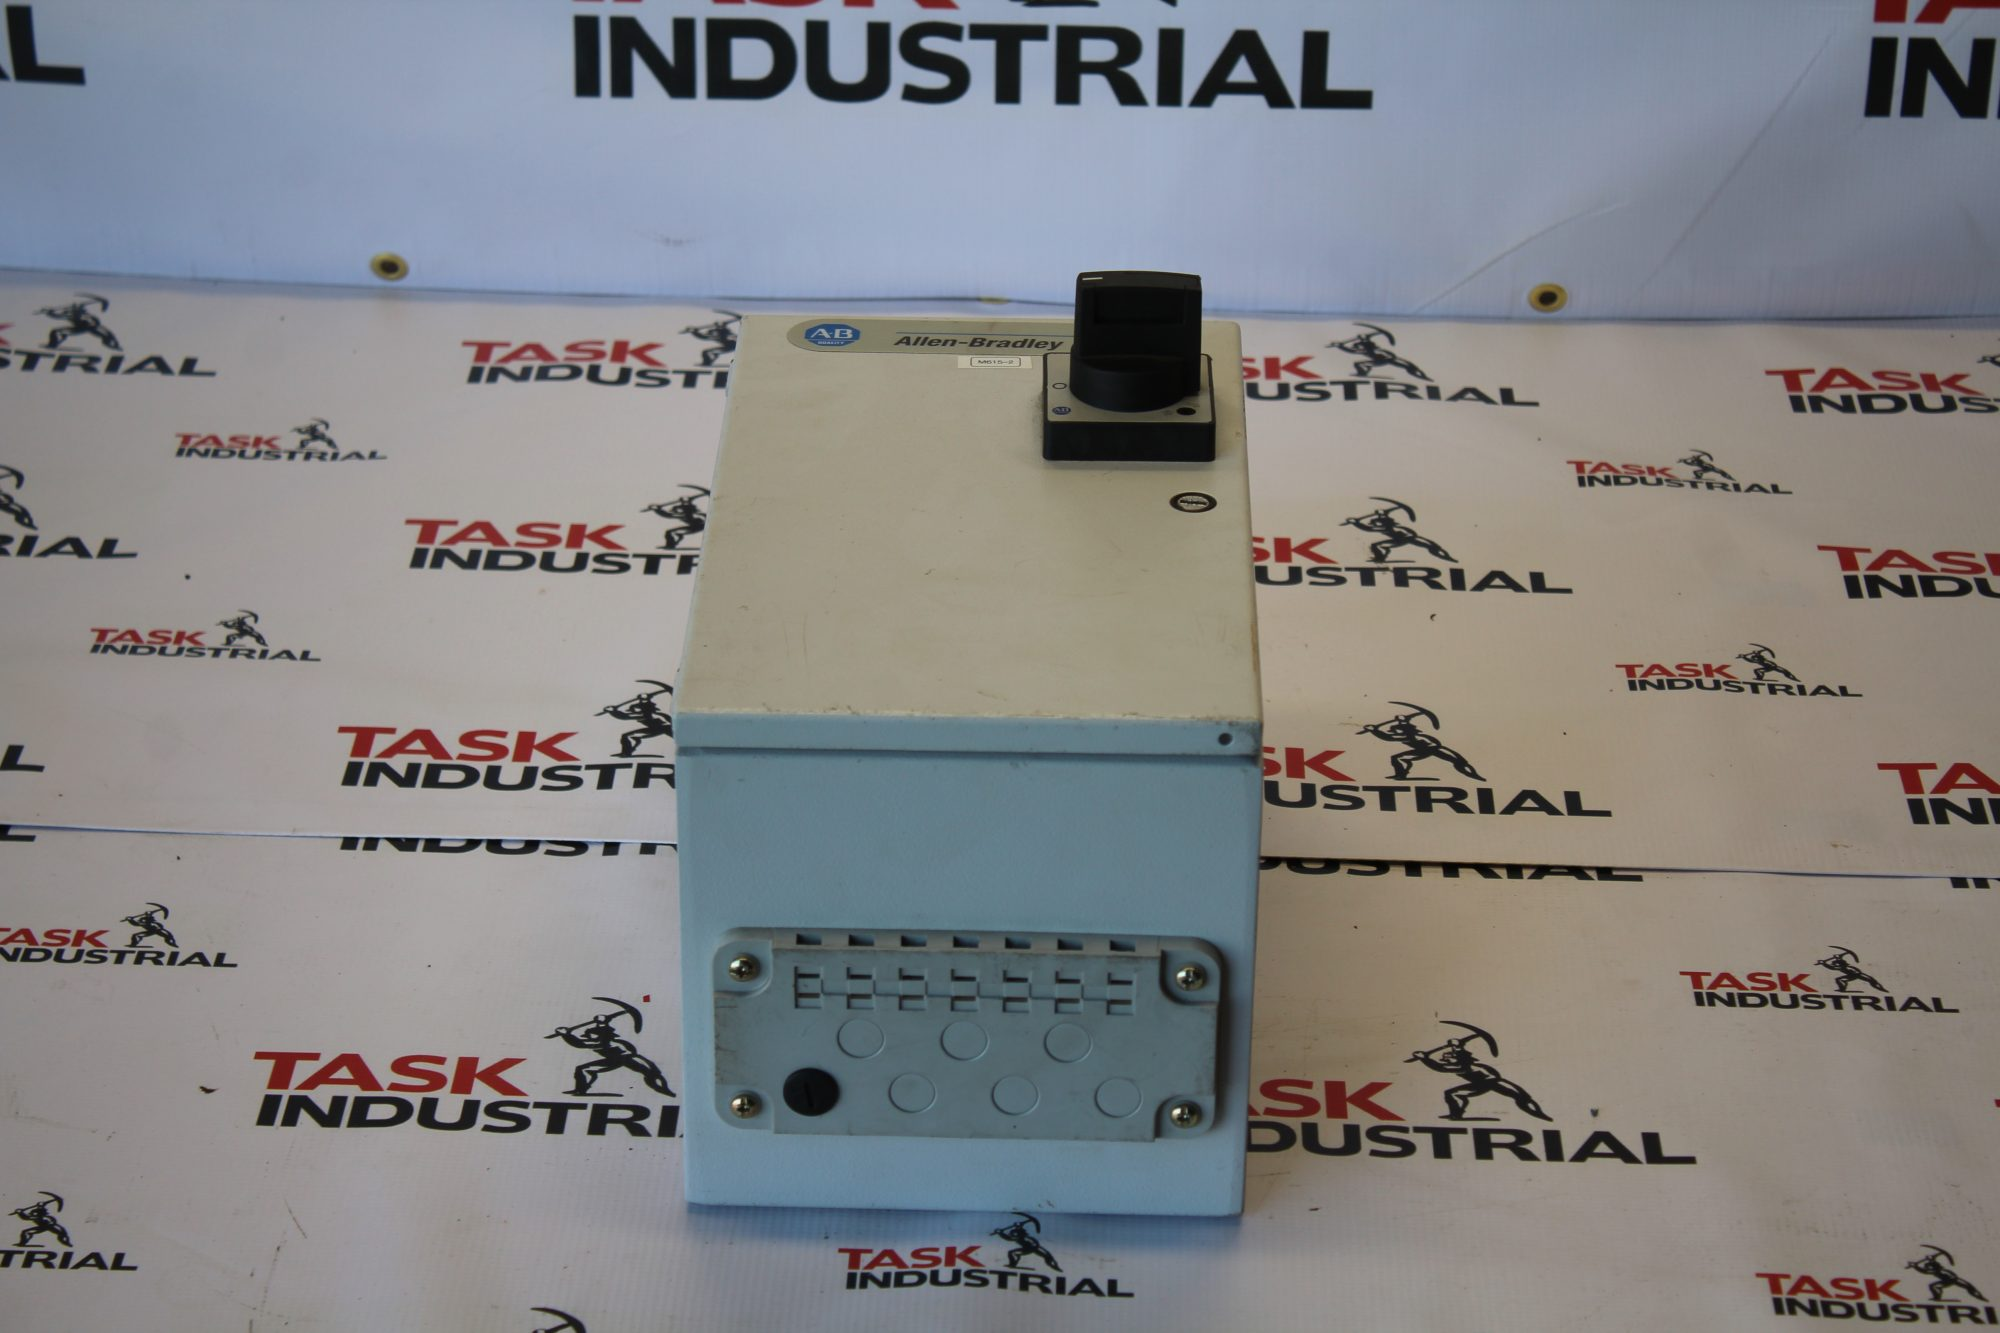 Allen-Bradley CAT NO. 198E-DF1488G1B Industrial Control Panel Enclosure